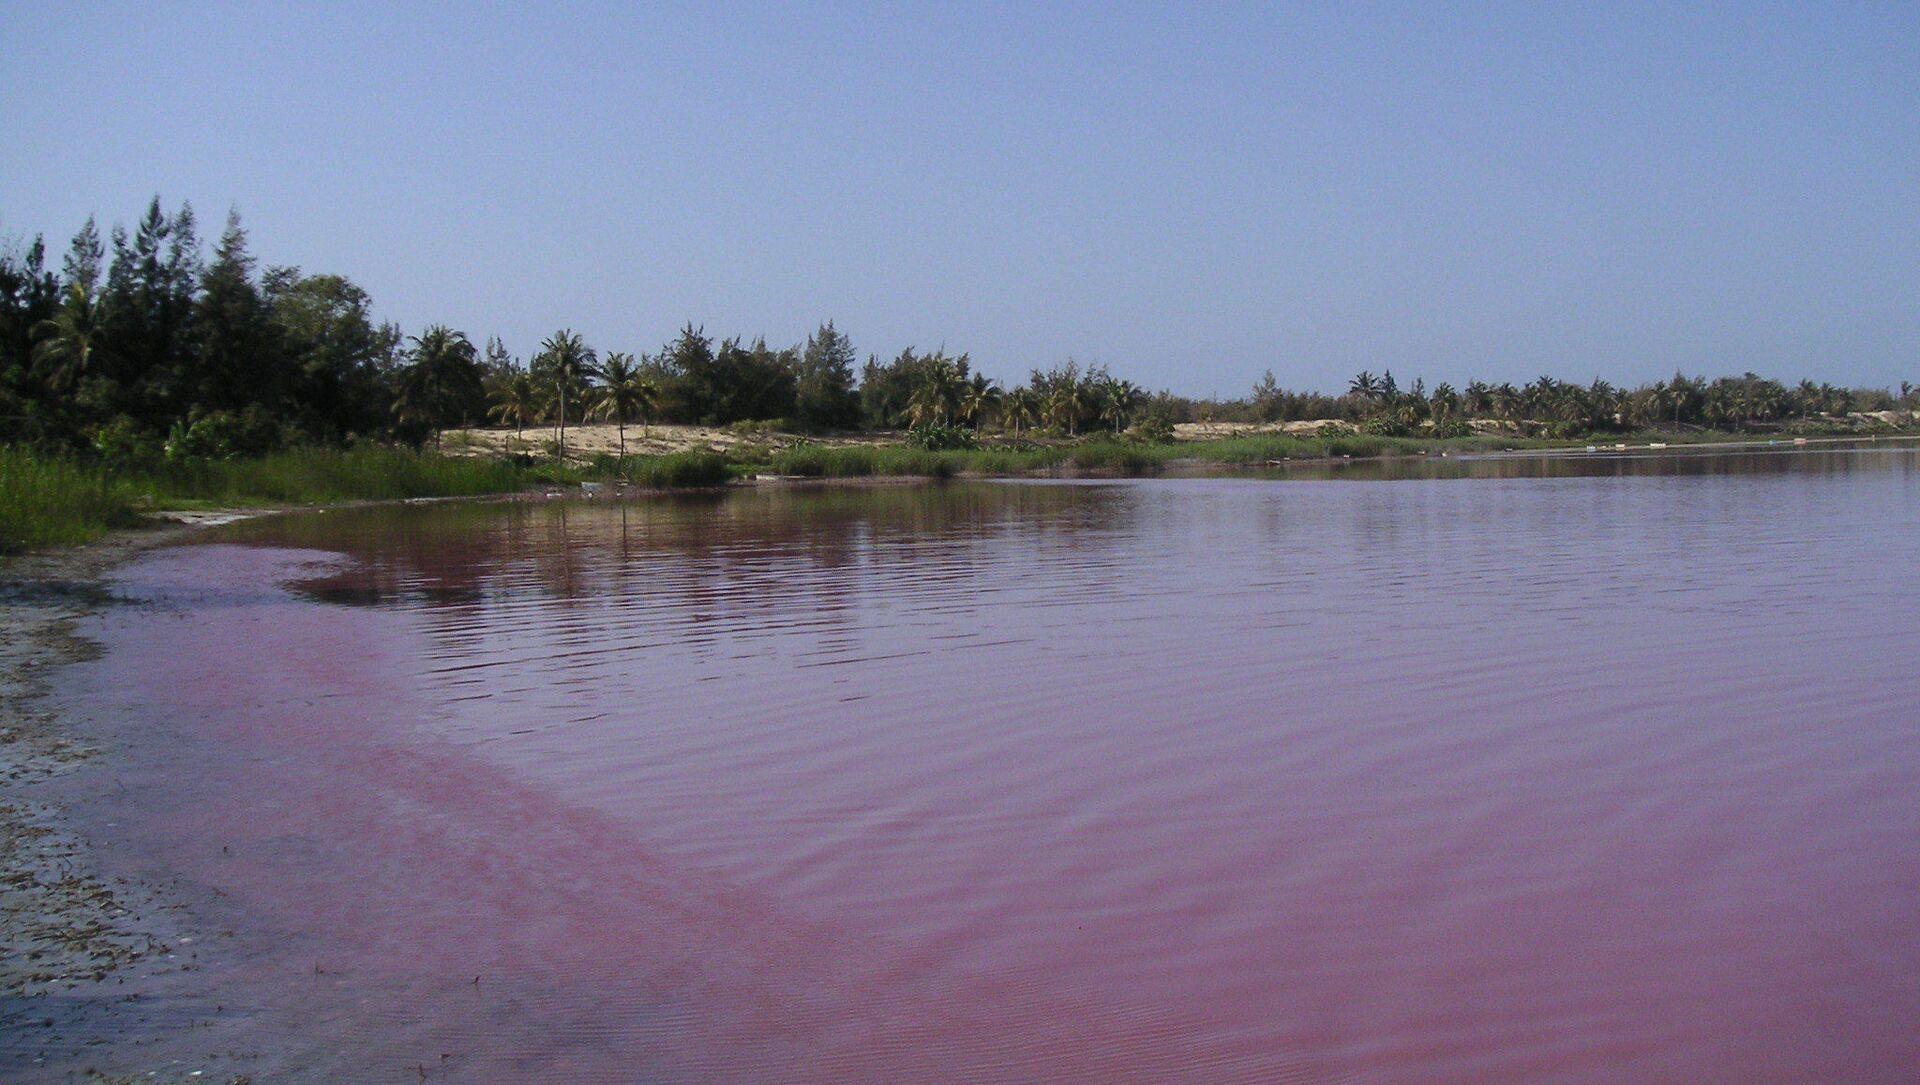 Pink lake - Sputnik International, 1920, 27.07.2021